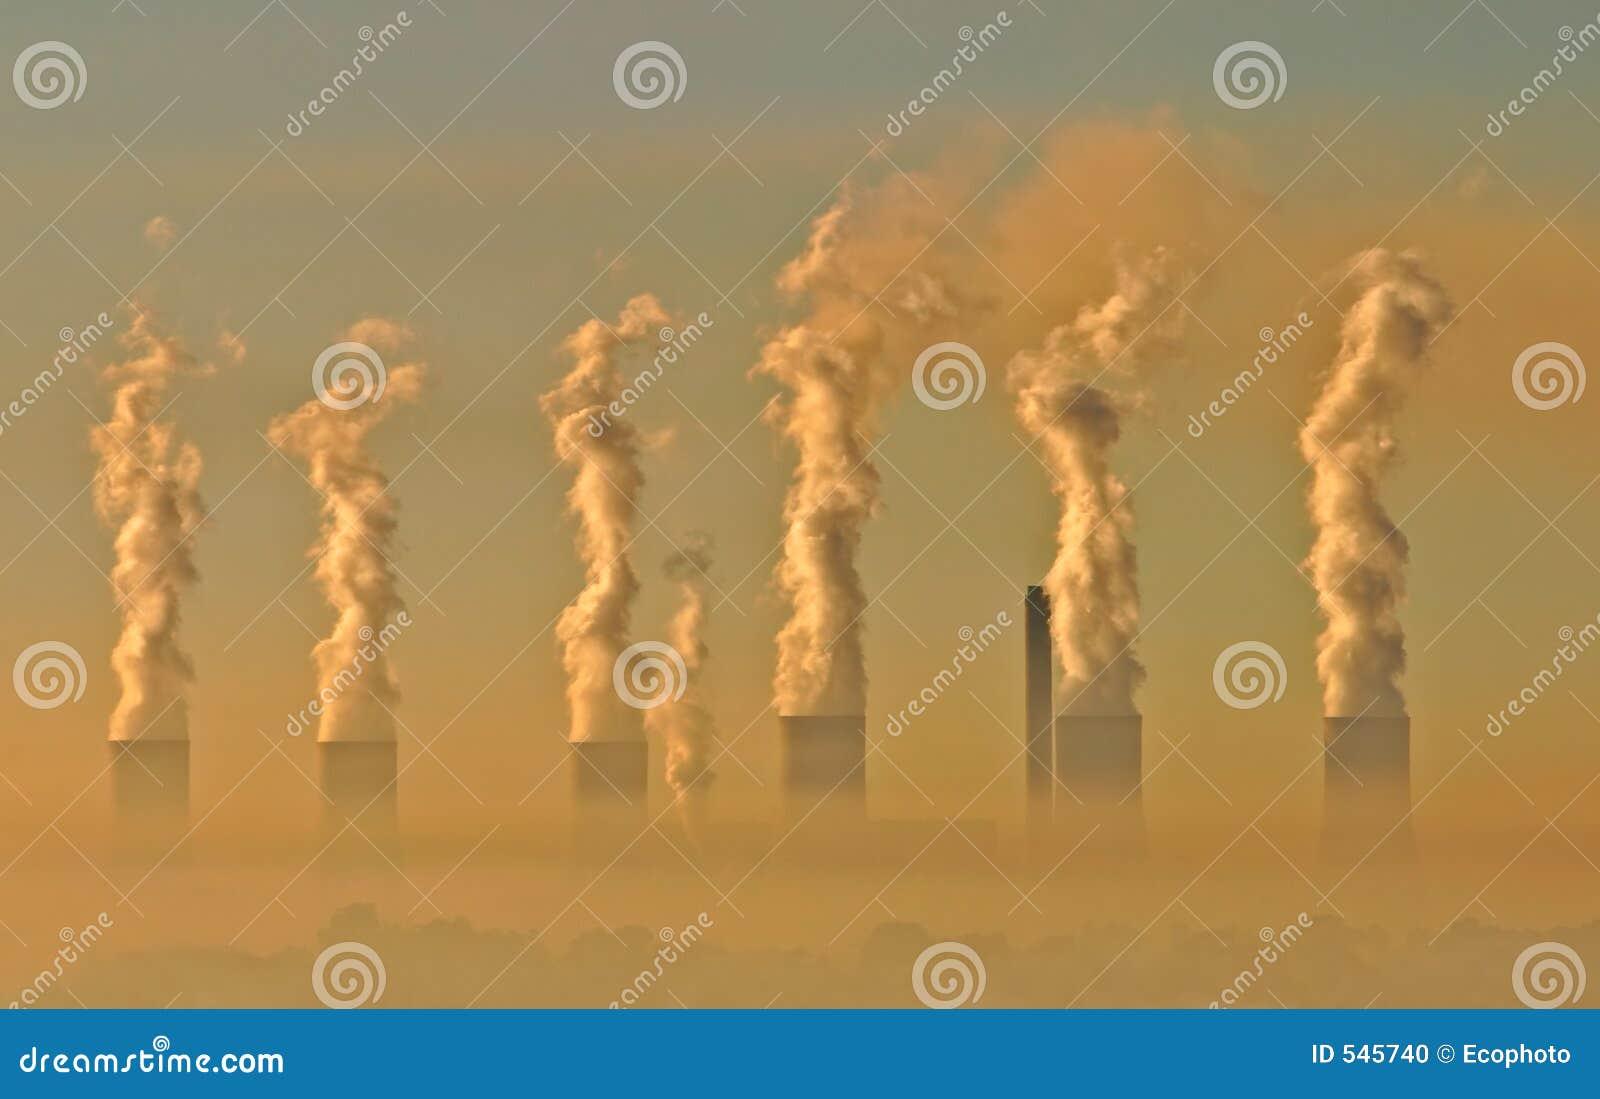 Industriële smog